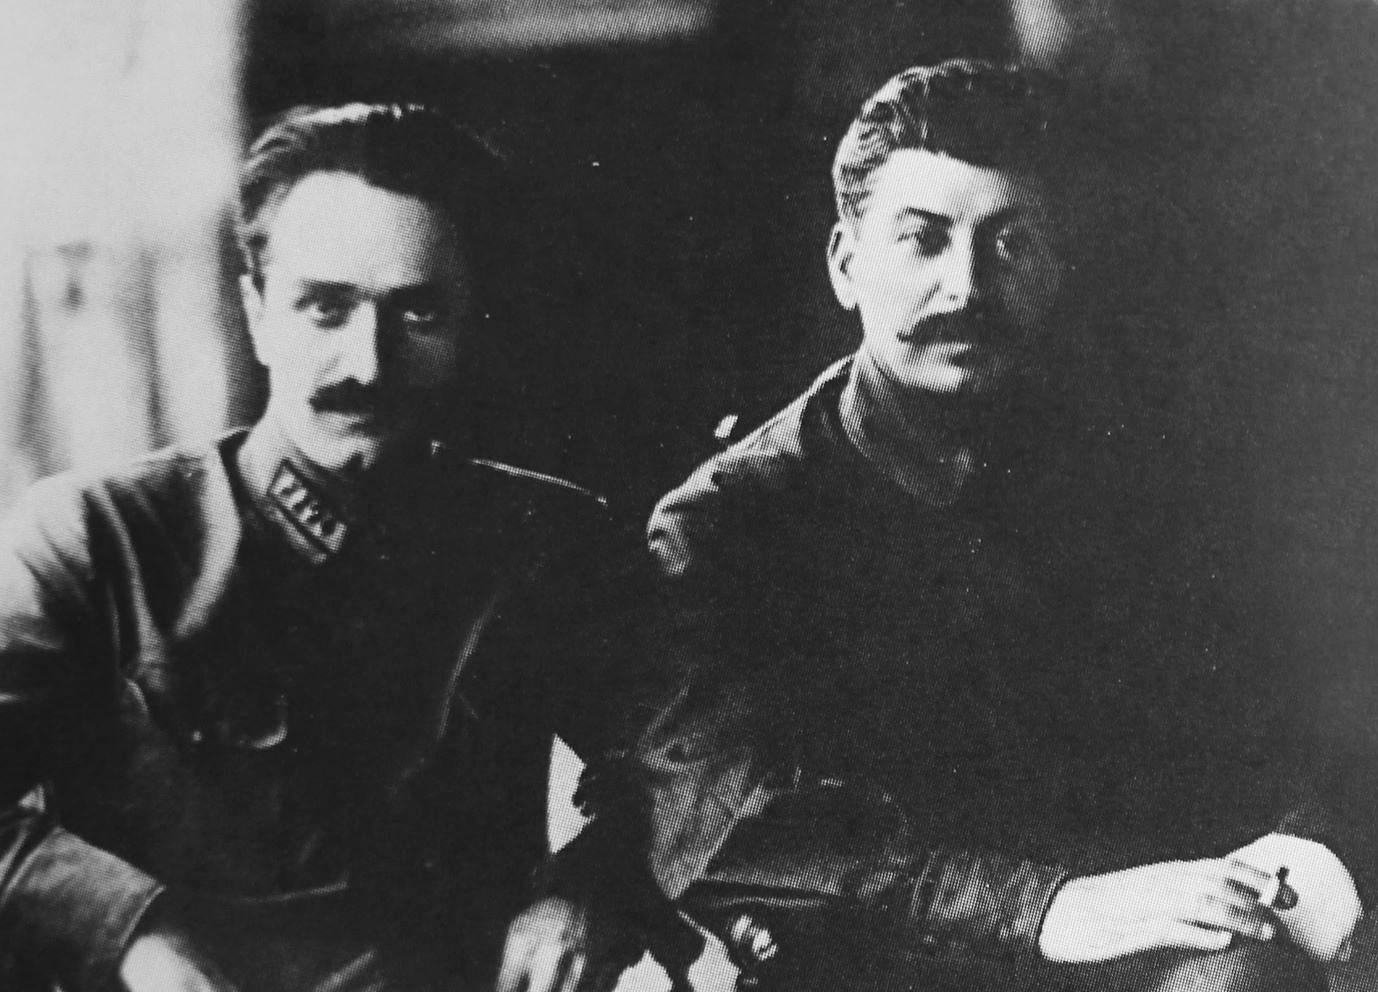 Анастас Микоян и Иосиф Сталин. Фото © Public Domain